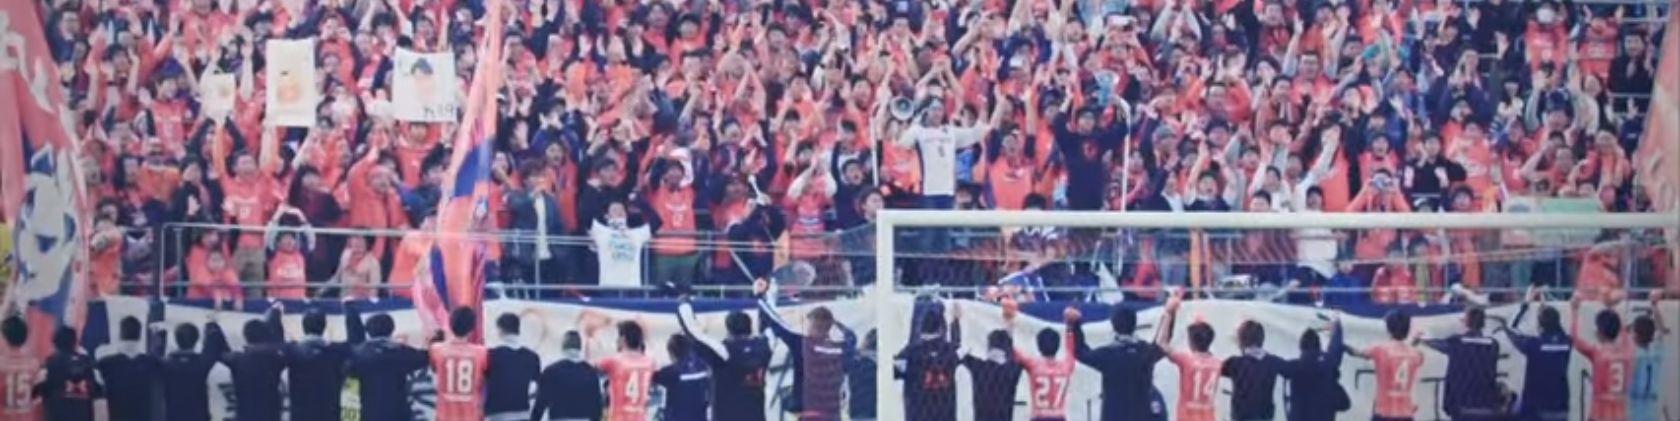 20160627-ntt-stadium-eyecatch-1600